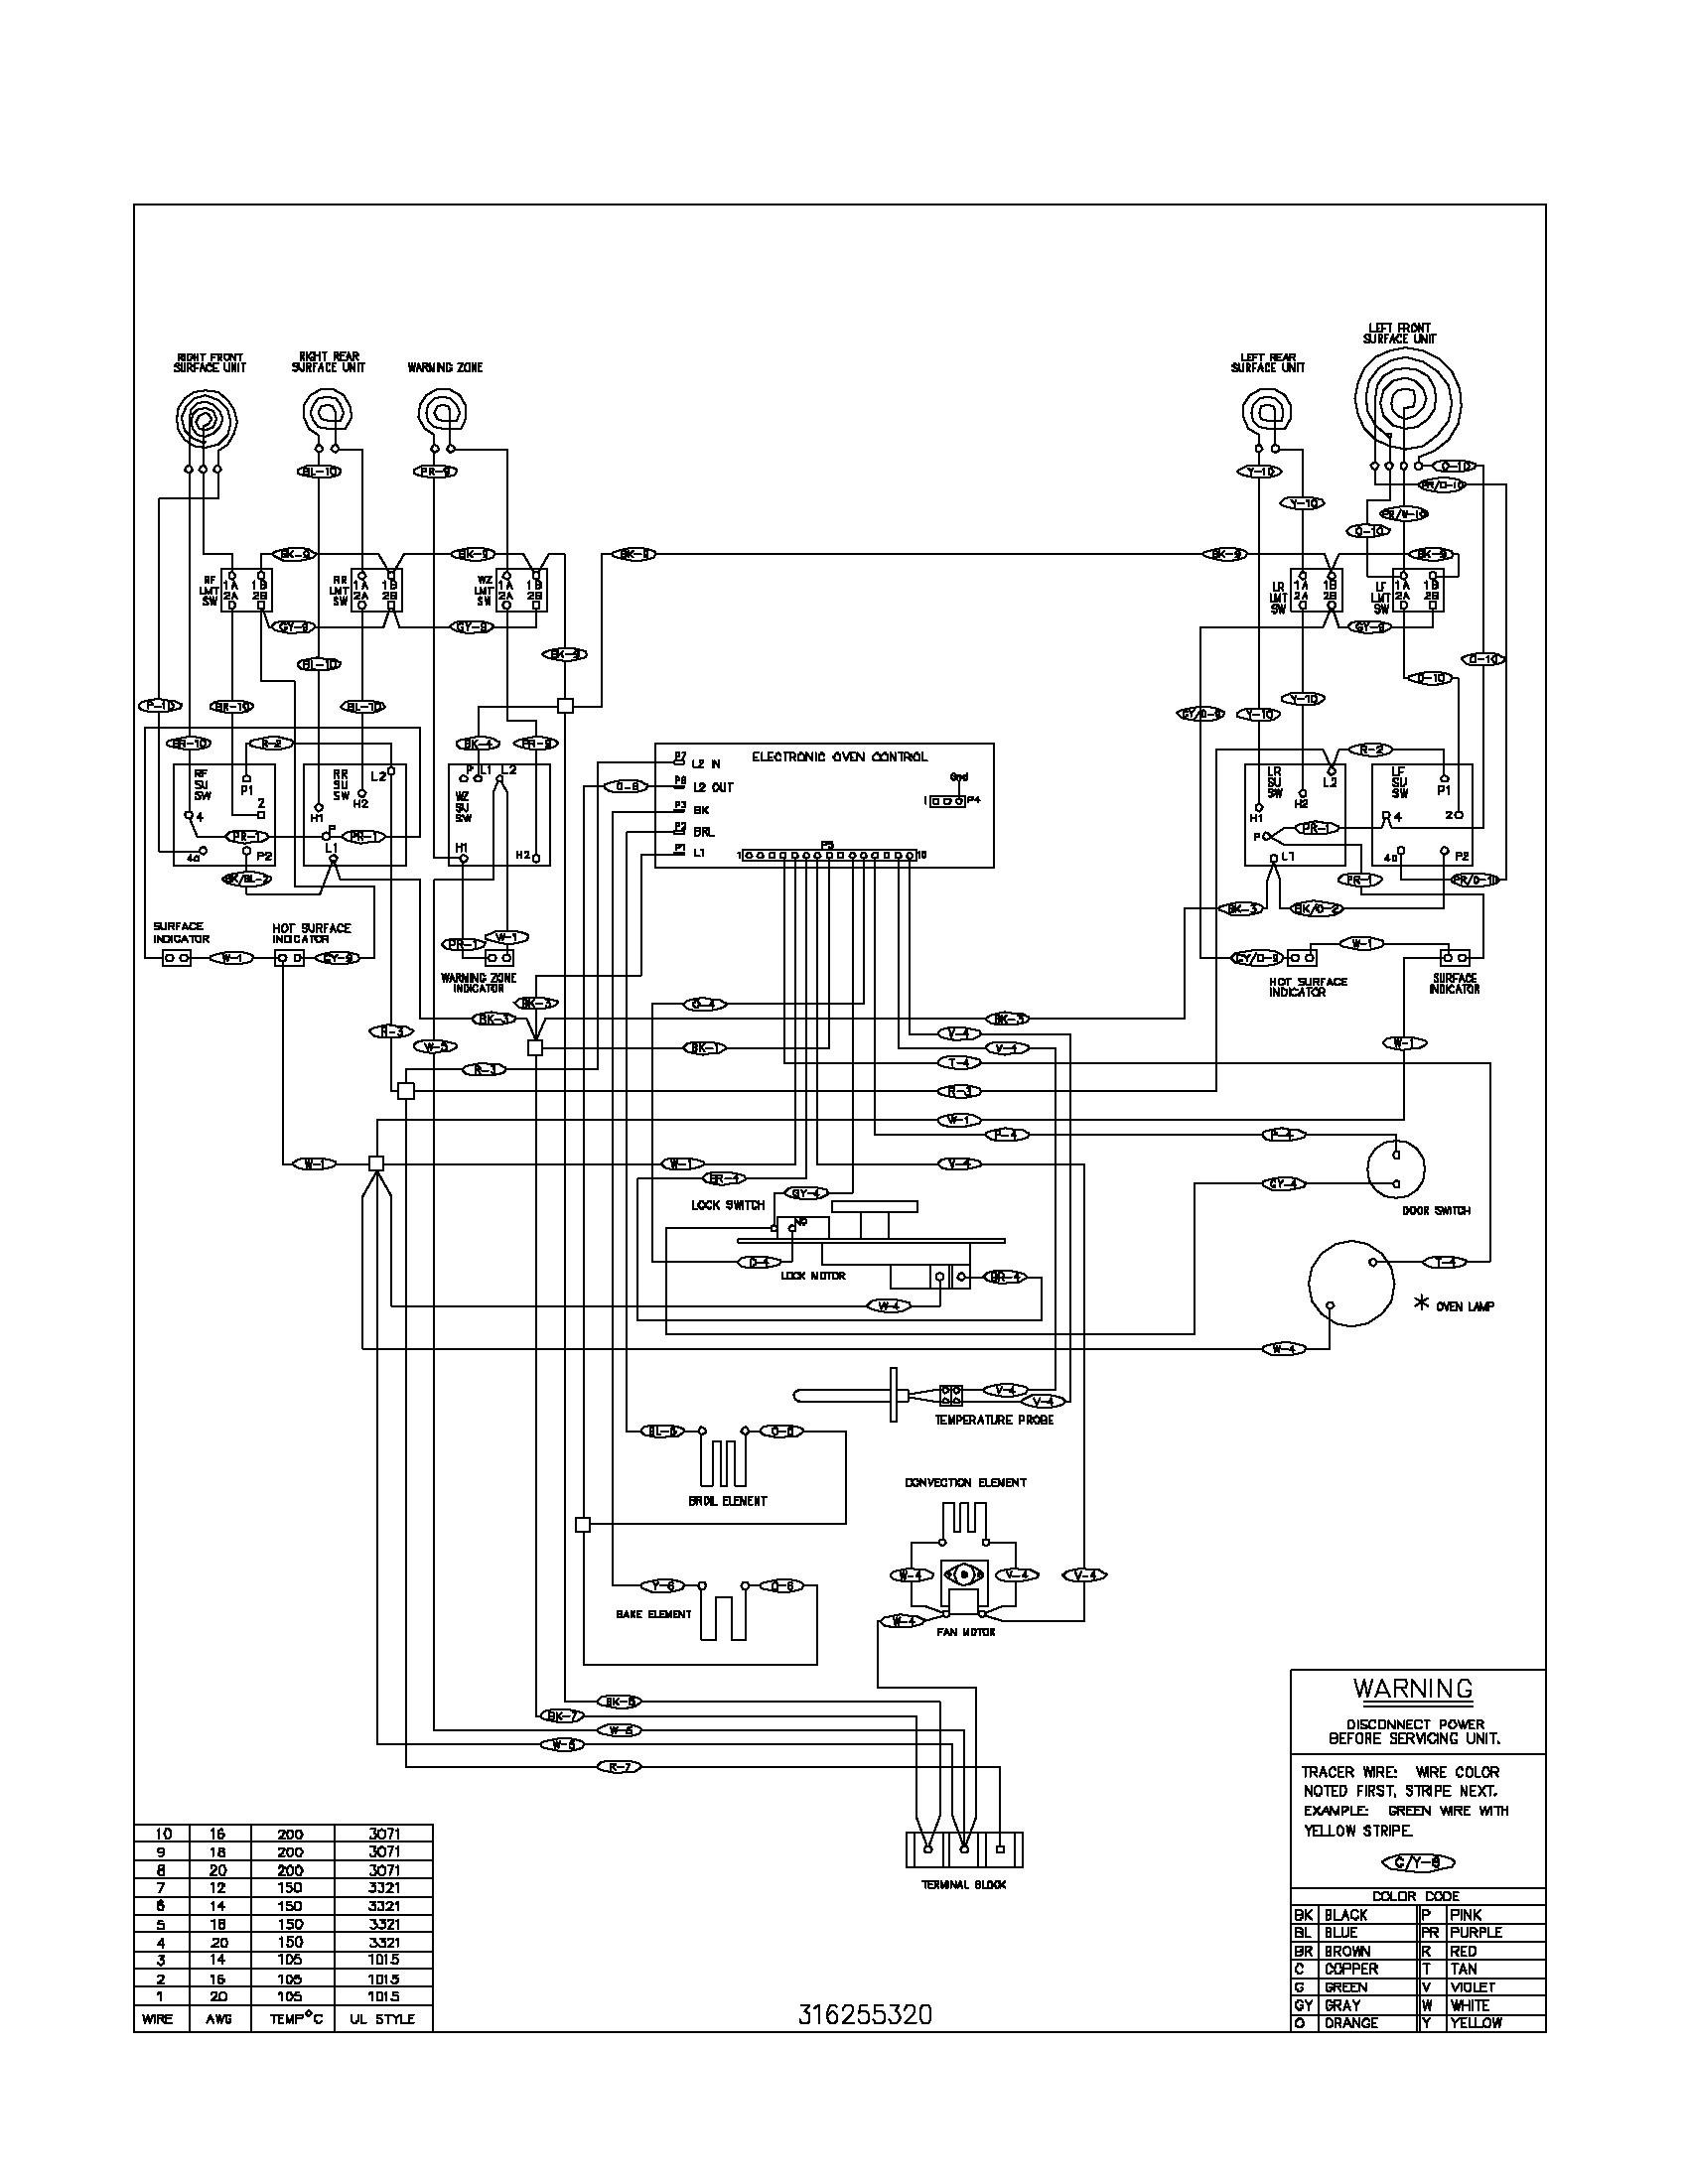 roper oven wiring diagram enthusiast wiring diagrams u2022 rh rasalibre co Roper Dryer Wiring Schematic kitchenaid electric dryer wiring diagram